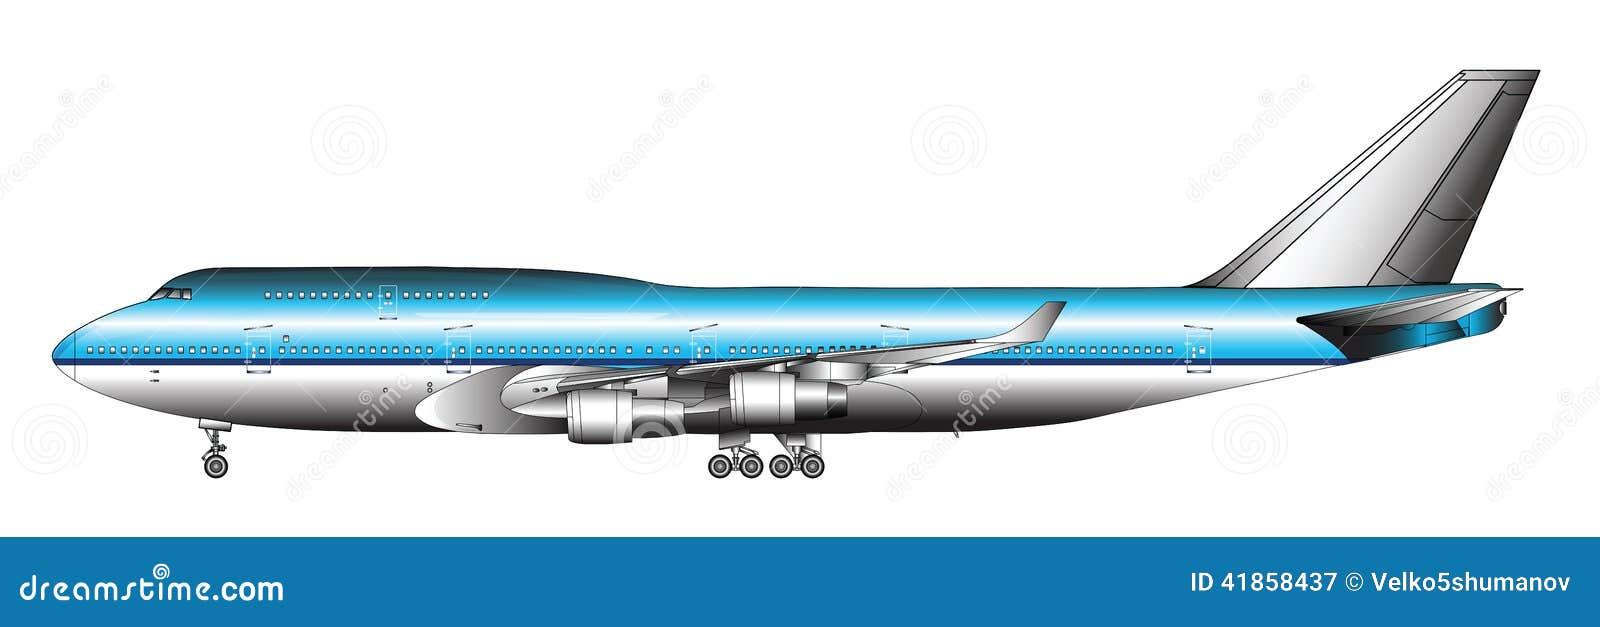 Ogromny pasażerski samolot